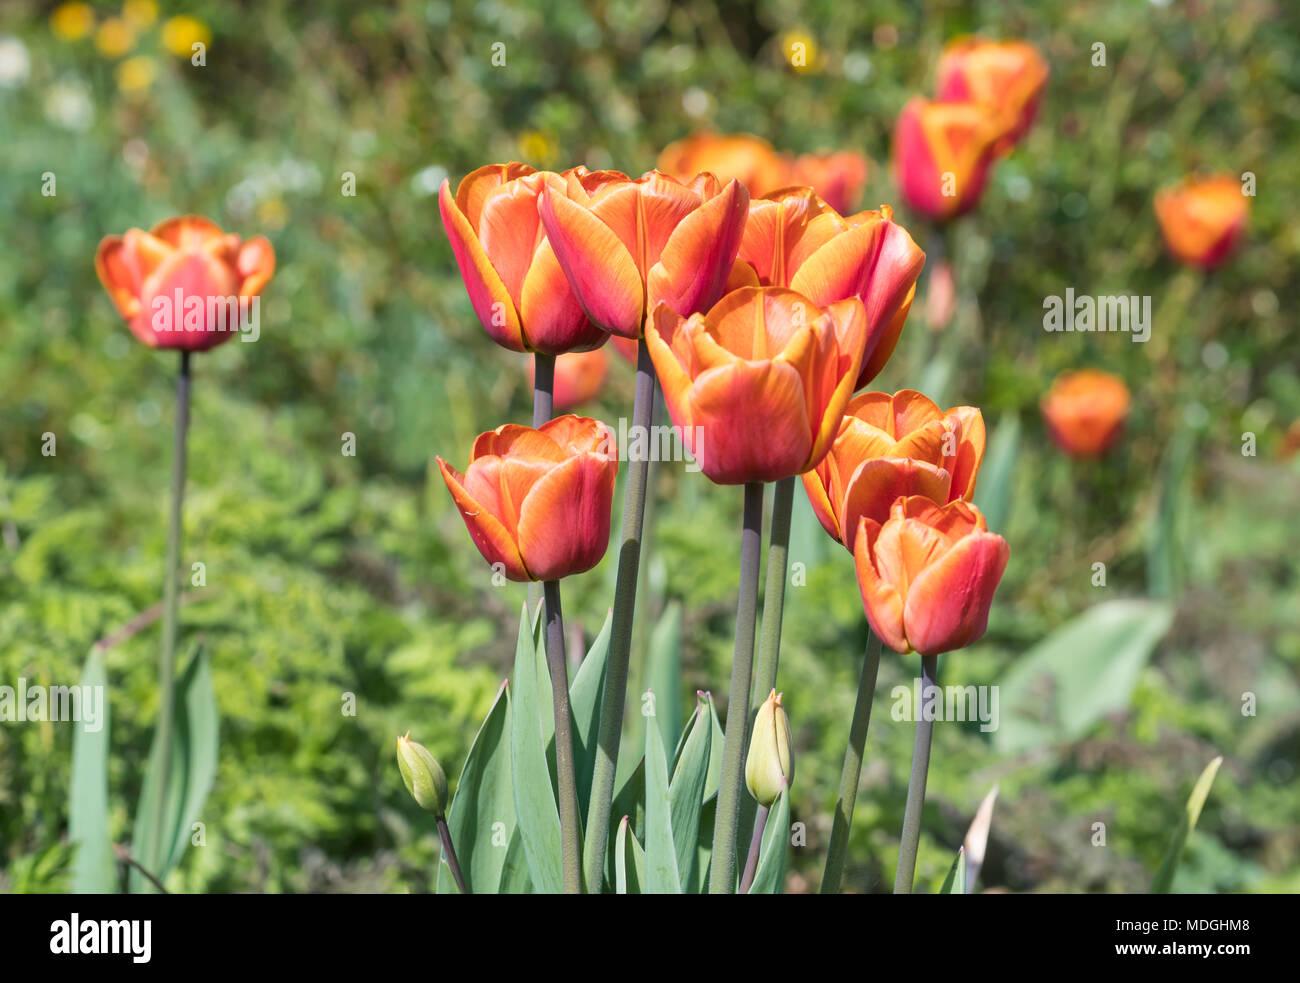 2 tone orange rouge Jardin tulipes (Tulipa Gesneriana, Didier's tulip) qui fleurit au printemps au Royaume-Uni. Photo Stock